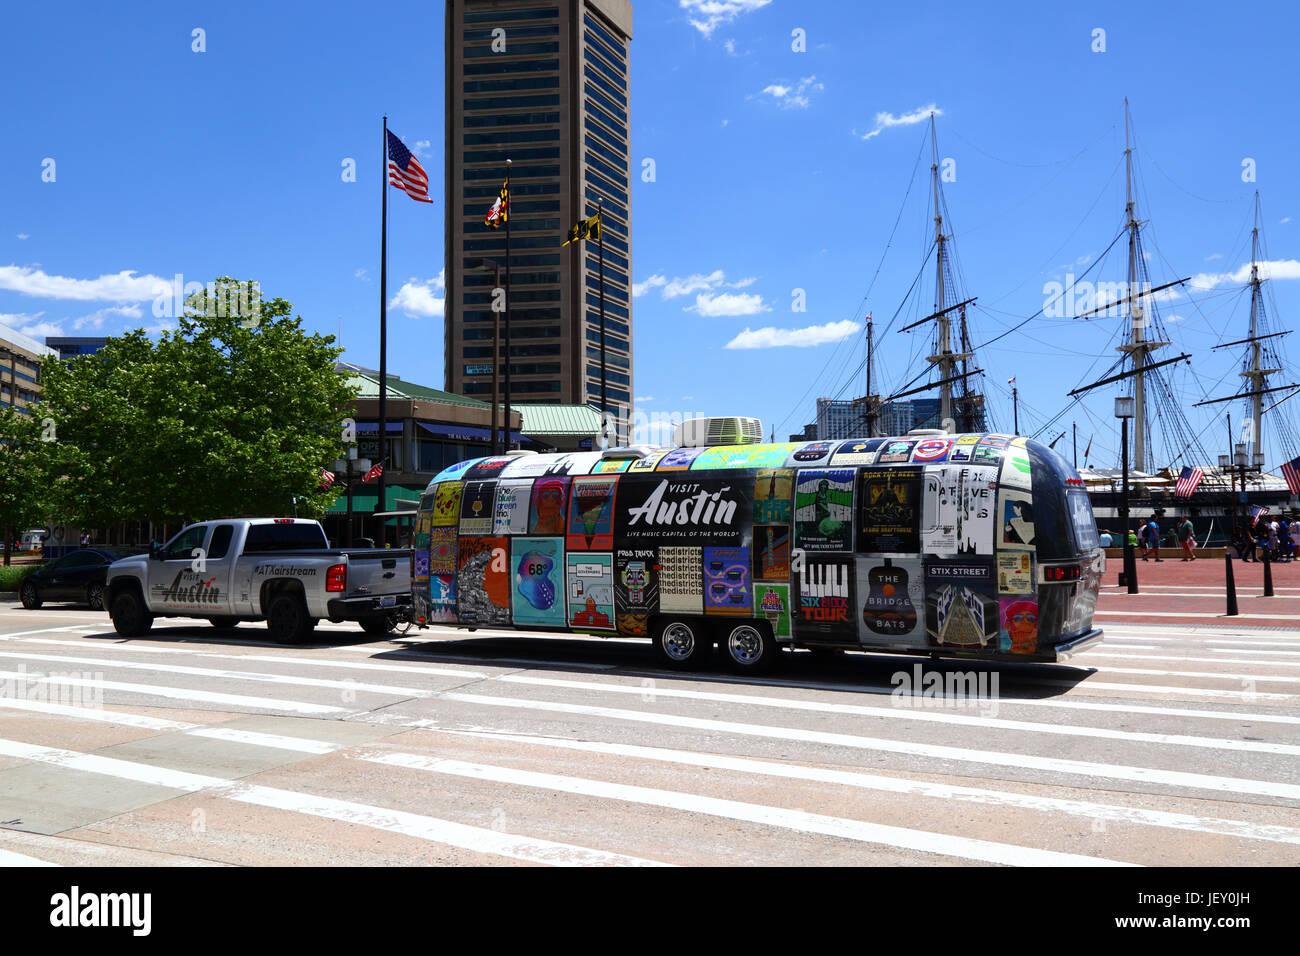 Pickup truck towing Airstream camper promoting Visit Austin